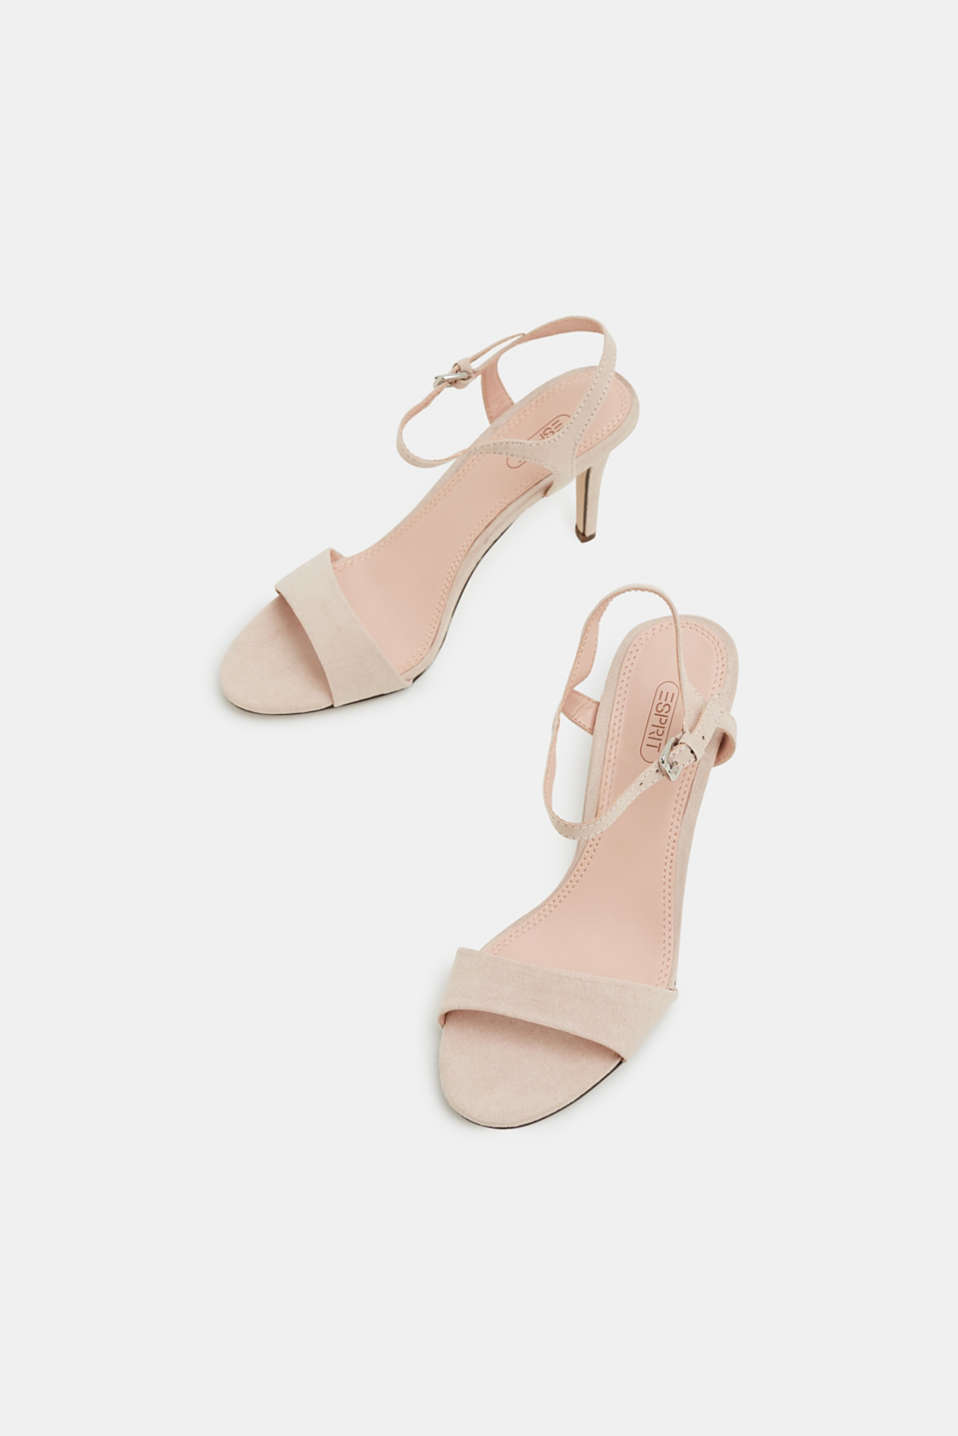 Faux suede sandals, SKIN BEIGE 2, detail image number 1